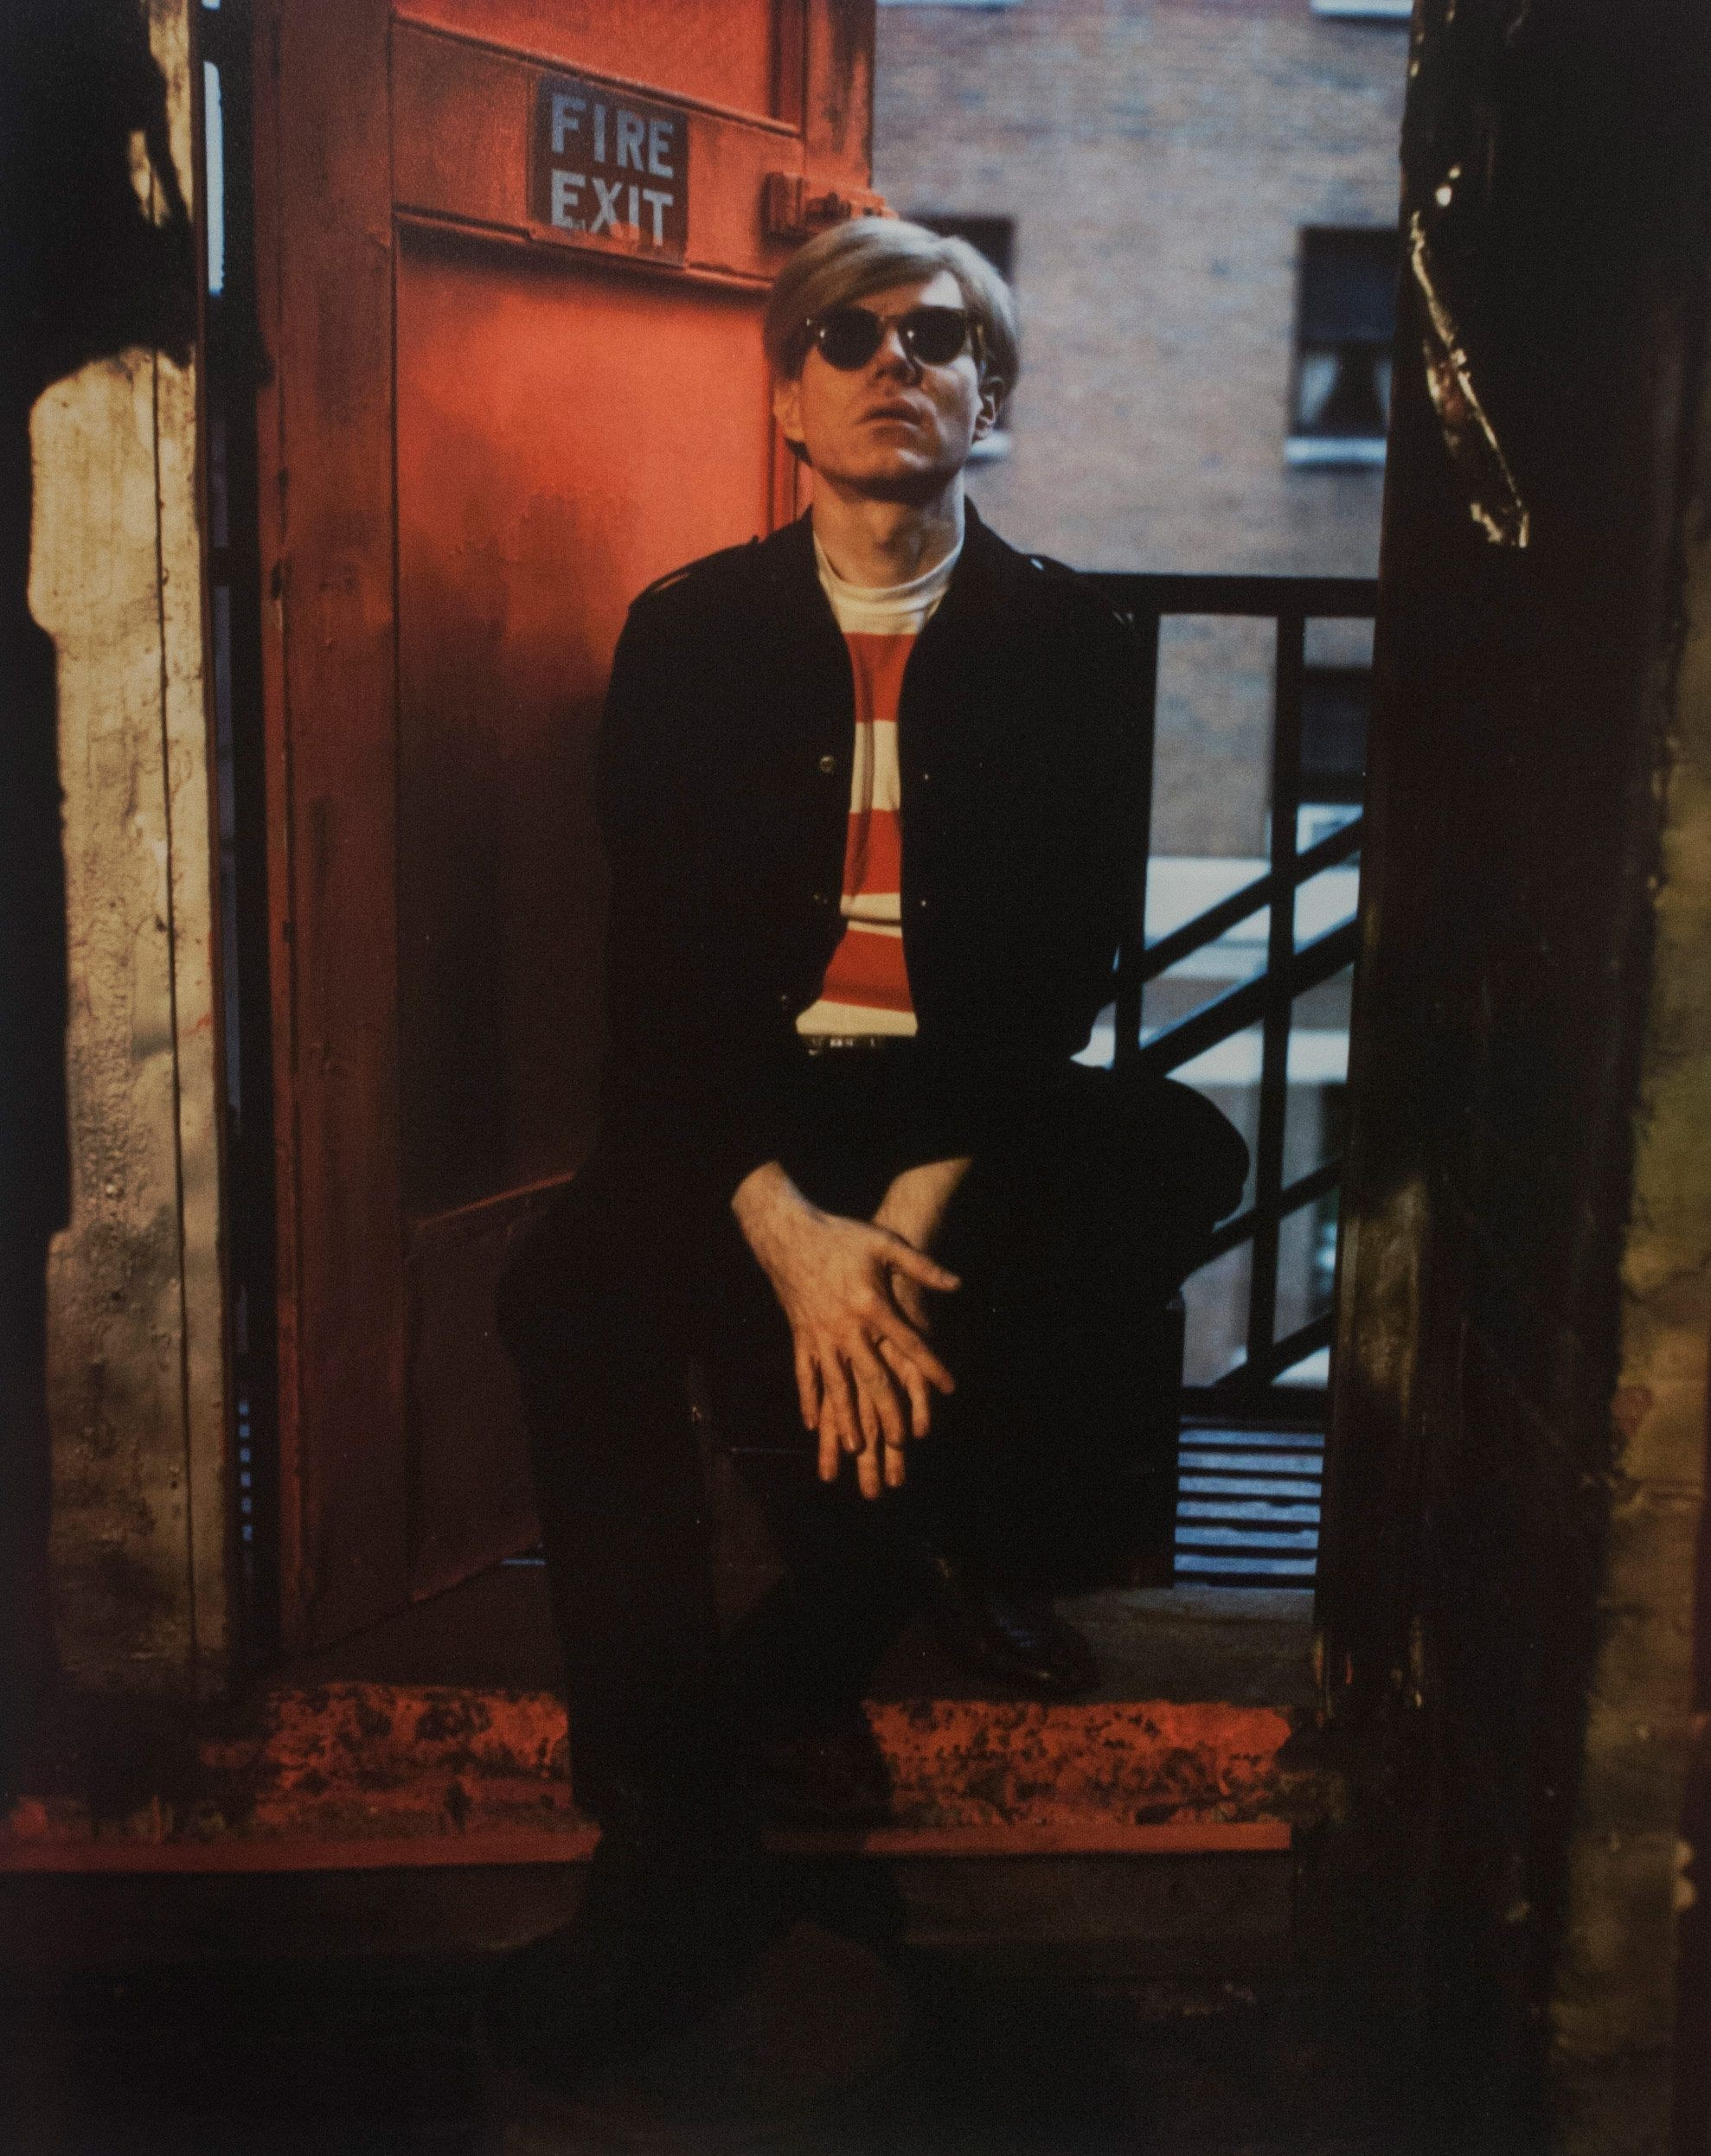 Энди Уорхол, 1966 год. Фотограф Мари Косиндас